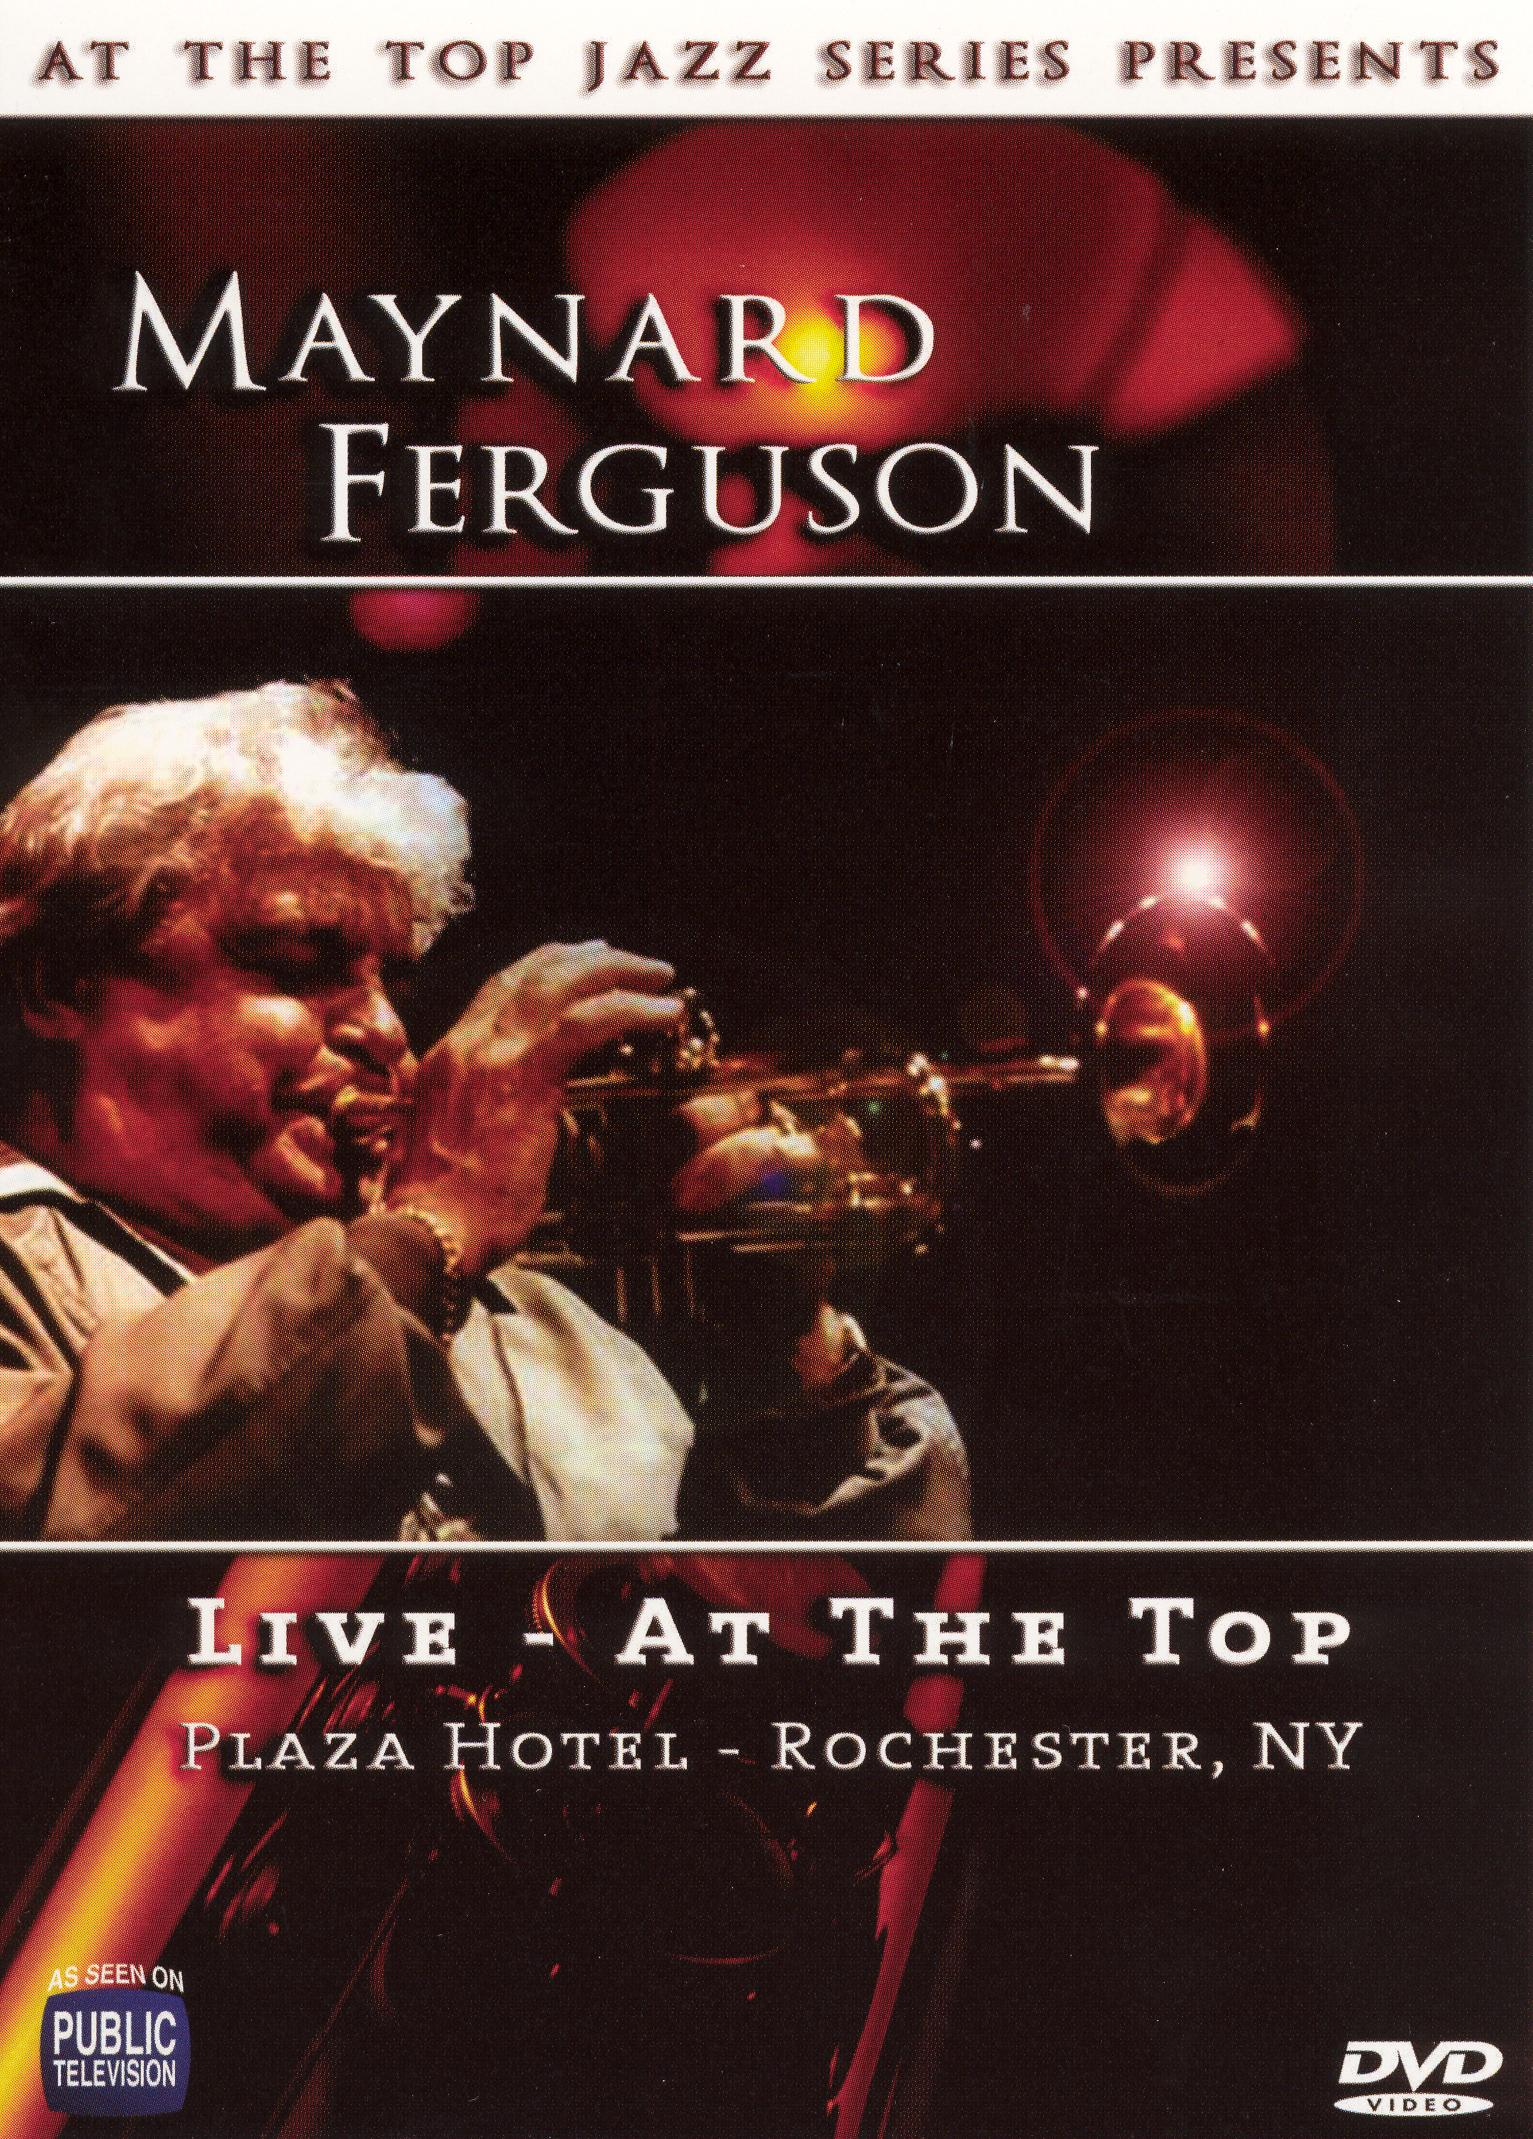 Maynard Ferguson: Live at the Top